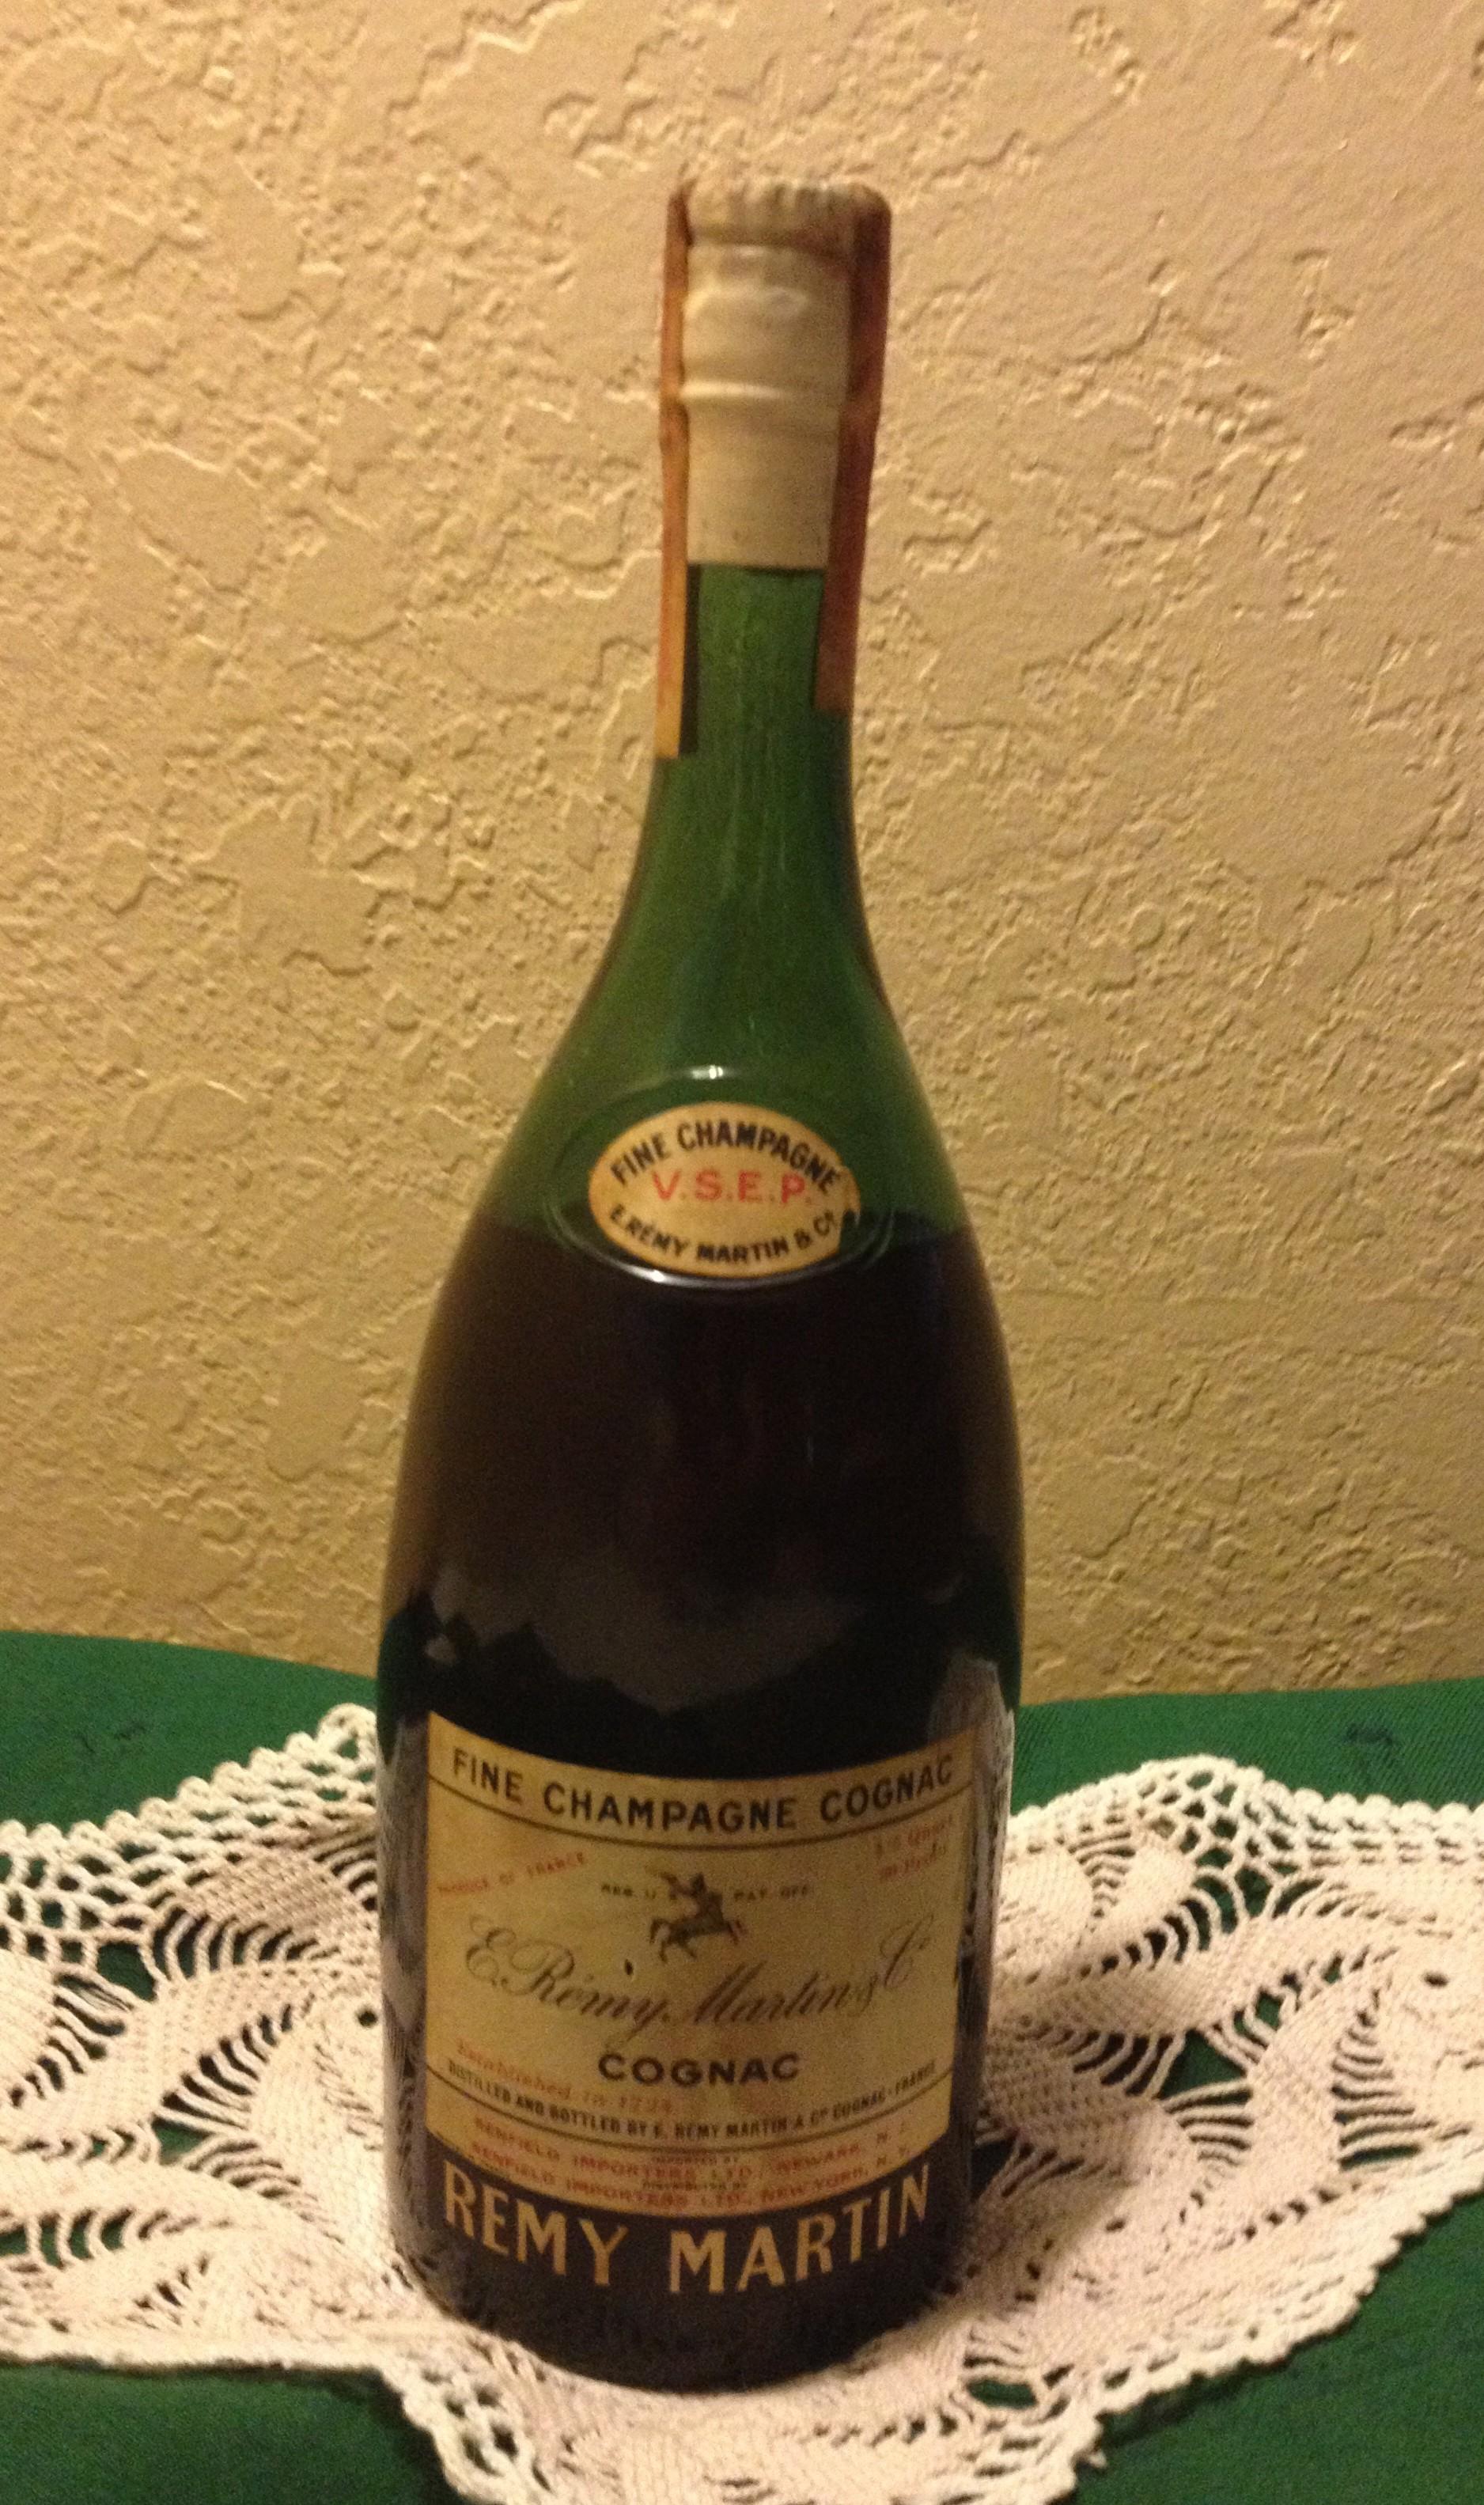 Rémy Martin Fine Champagne